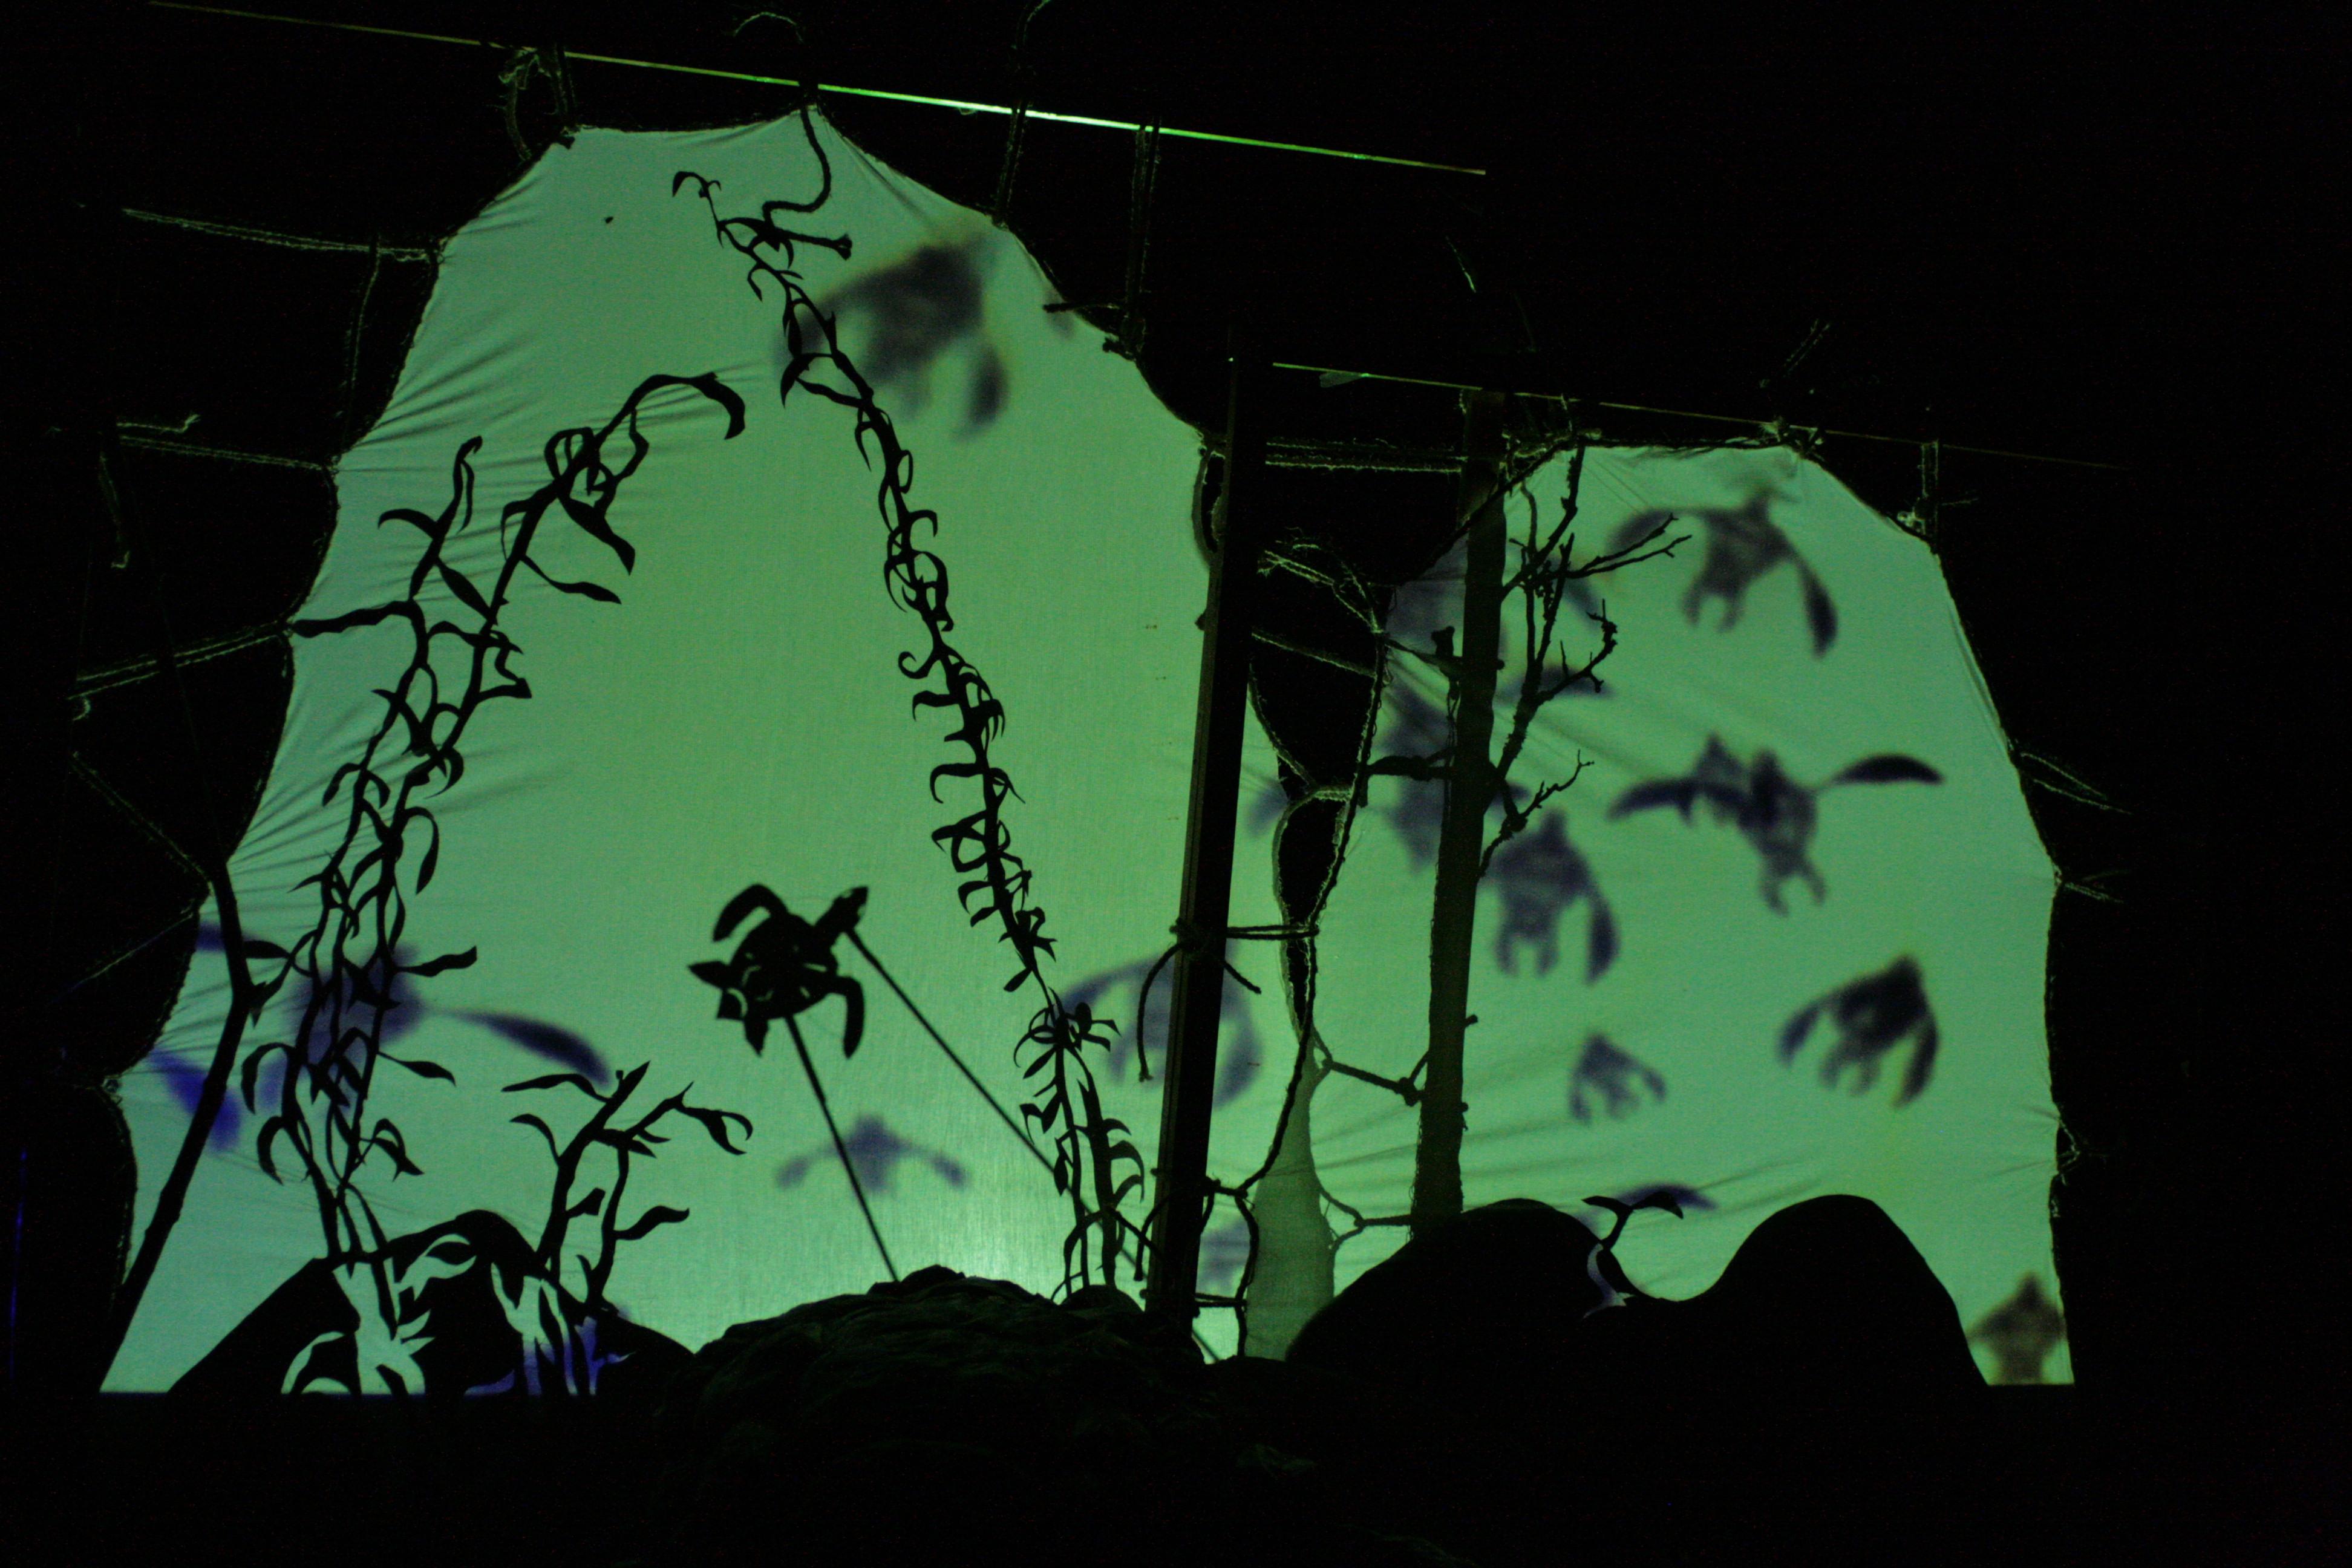 <em>Turning Turtles</em> par Beyond the Bark Puppet and Installation Theatre (Limerick, Irlande), histoire, mise en scène et marionnettes : Daragh Bradshaw, Emma Fisher, Mags O'Donoghue, scénario : Duncan Molloy, scénographie : Daragh Bradshaw, Emma Fisher, design d'éclairage : Kev O'Malley, design sonore : Ger O'Donnell. Théâtre d'ombres